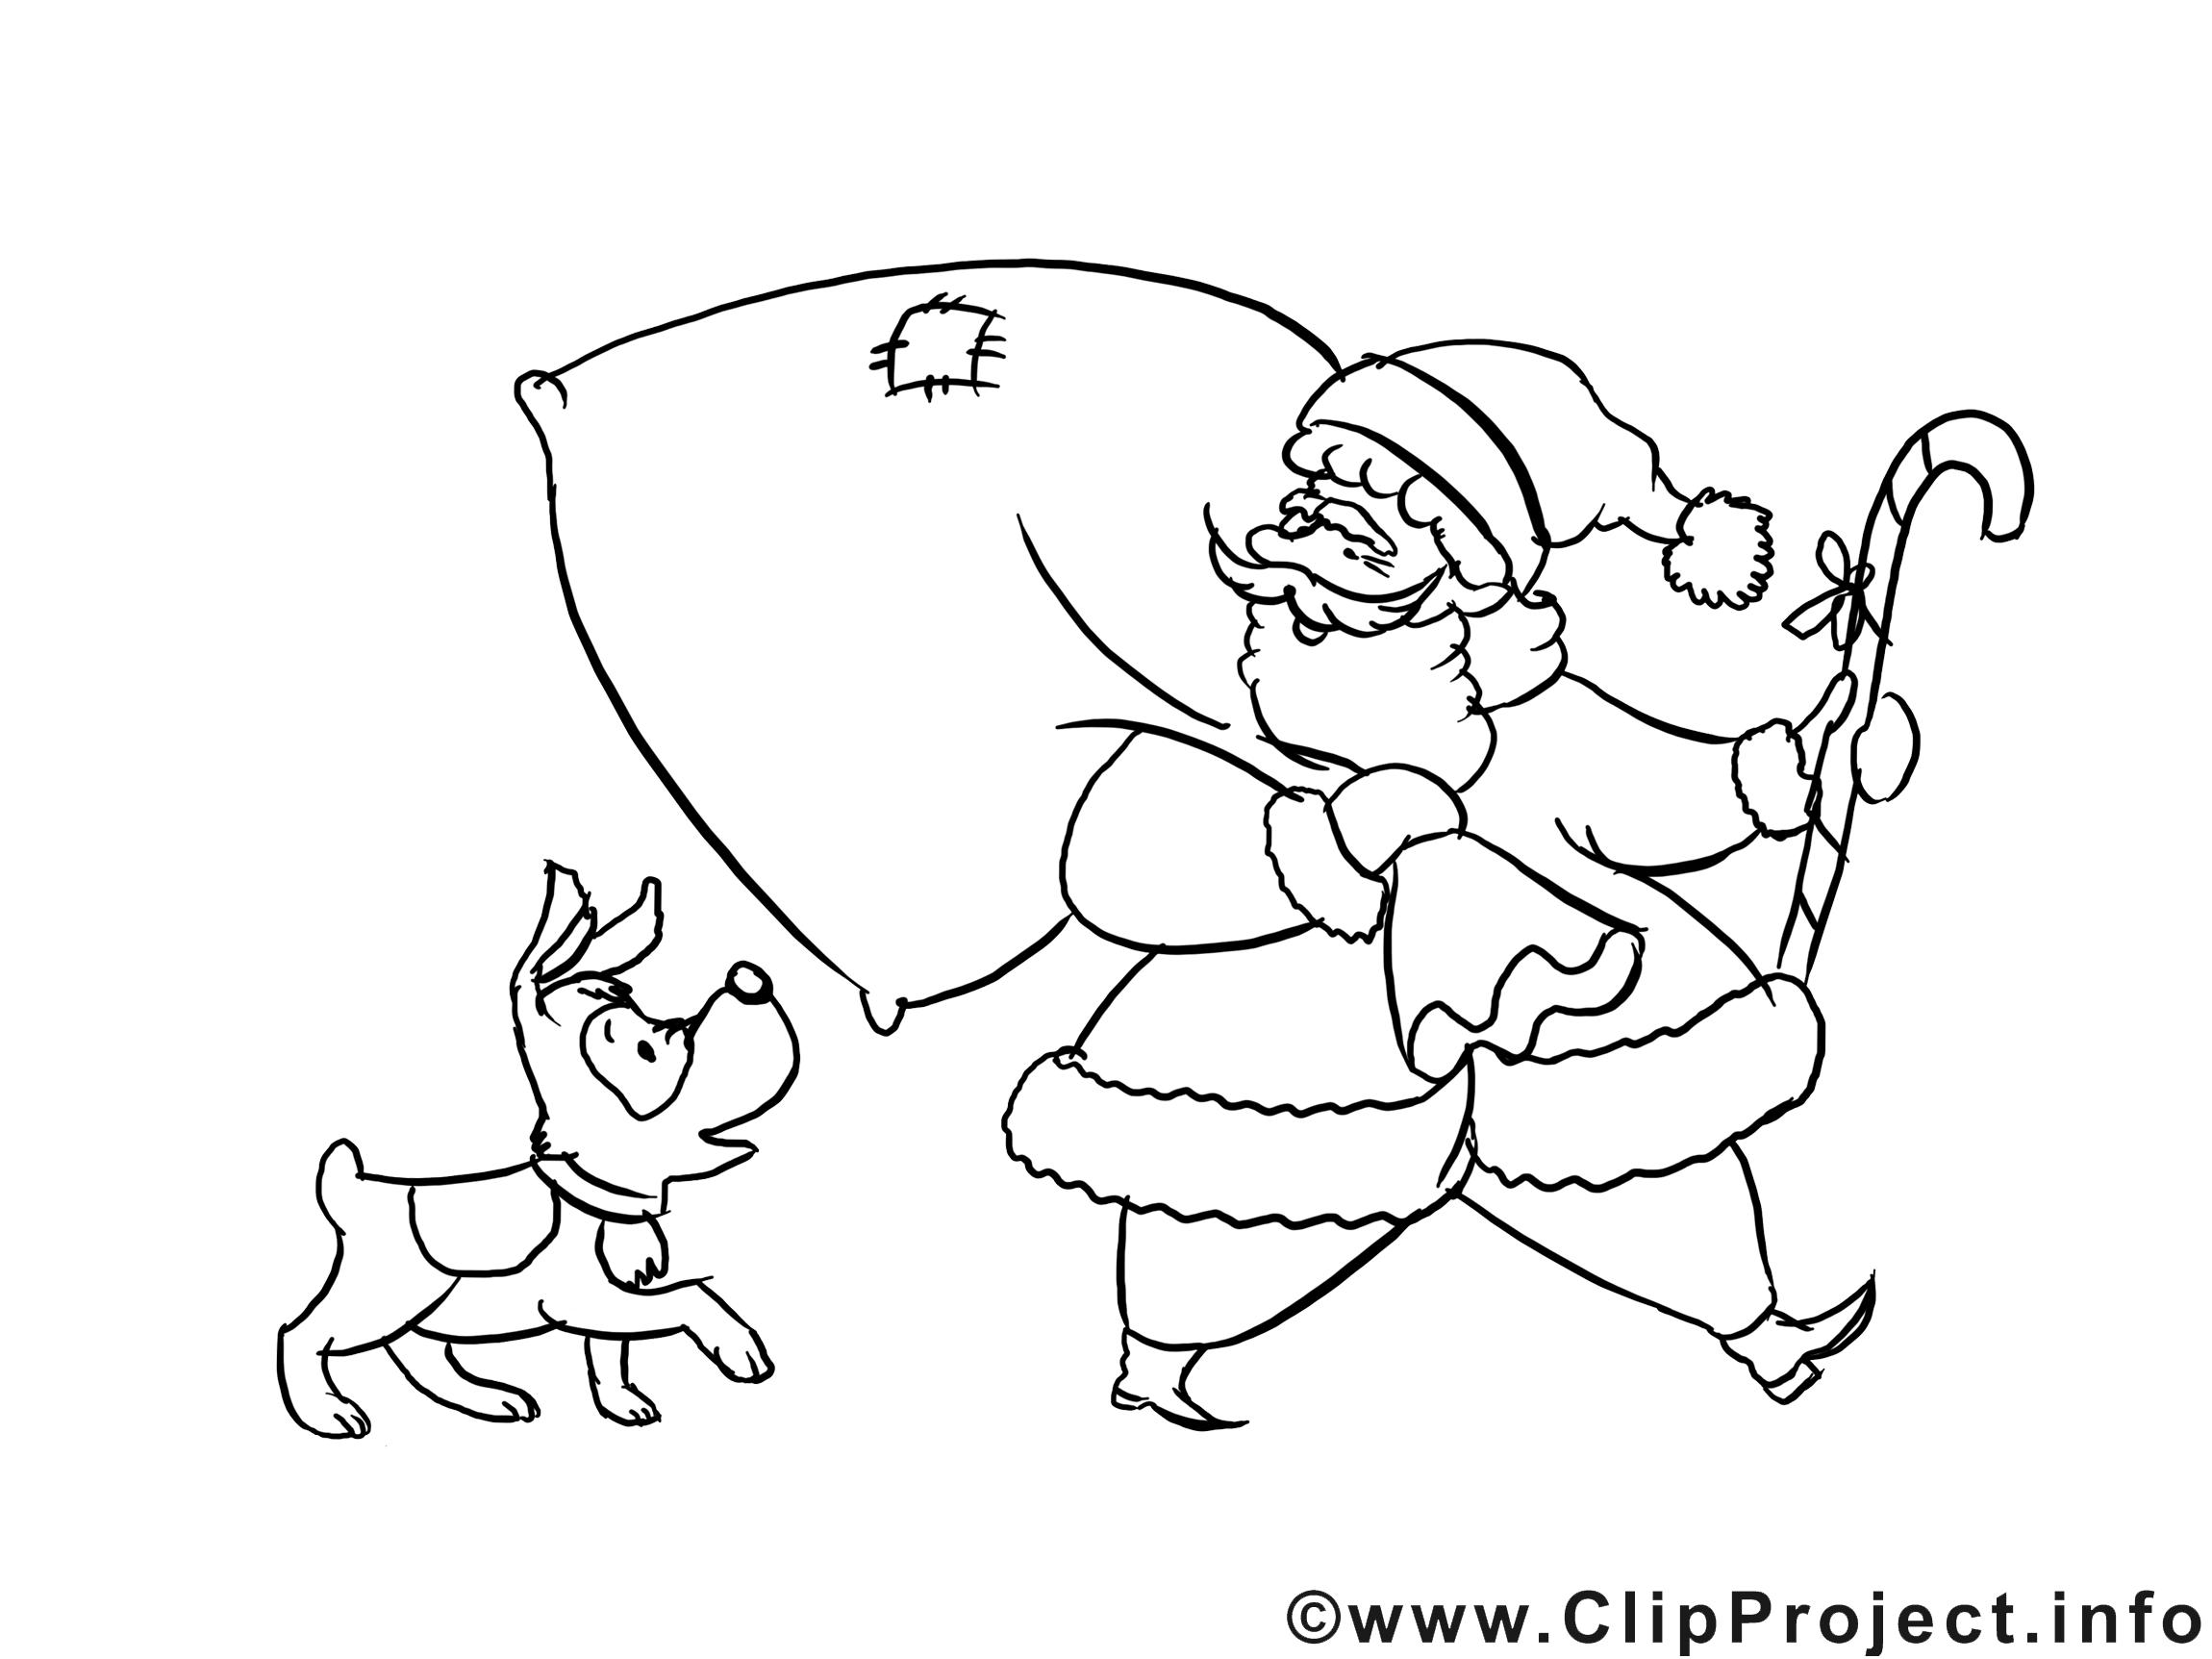 Chien sac illustration – Noël à imprimer